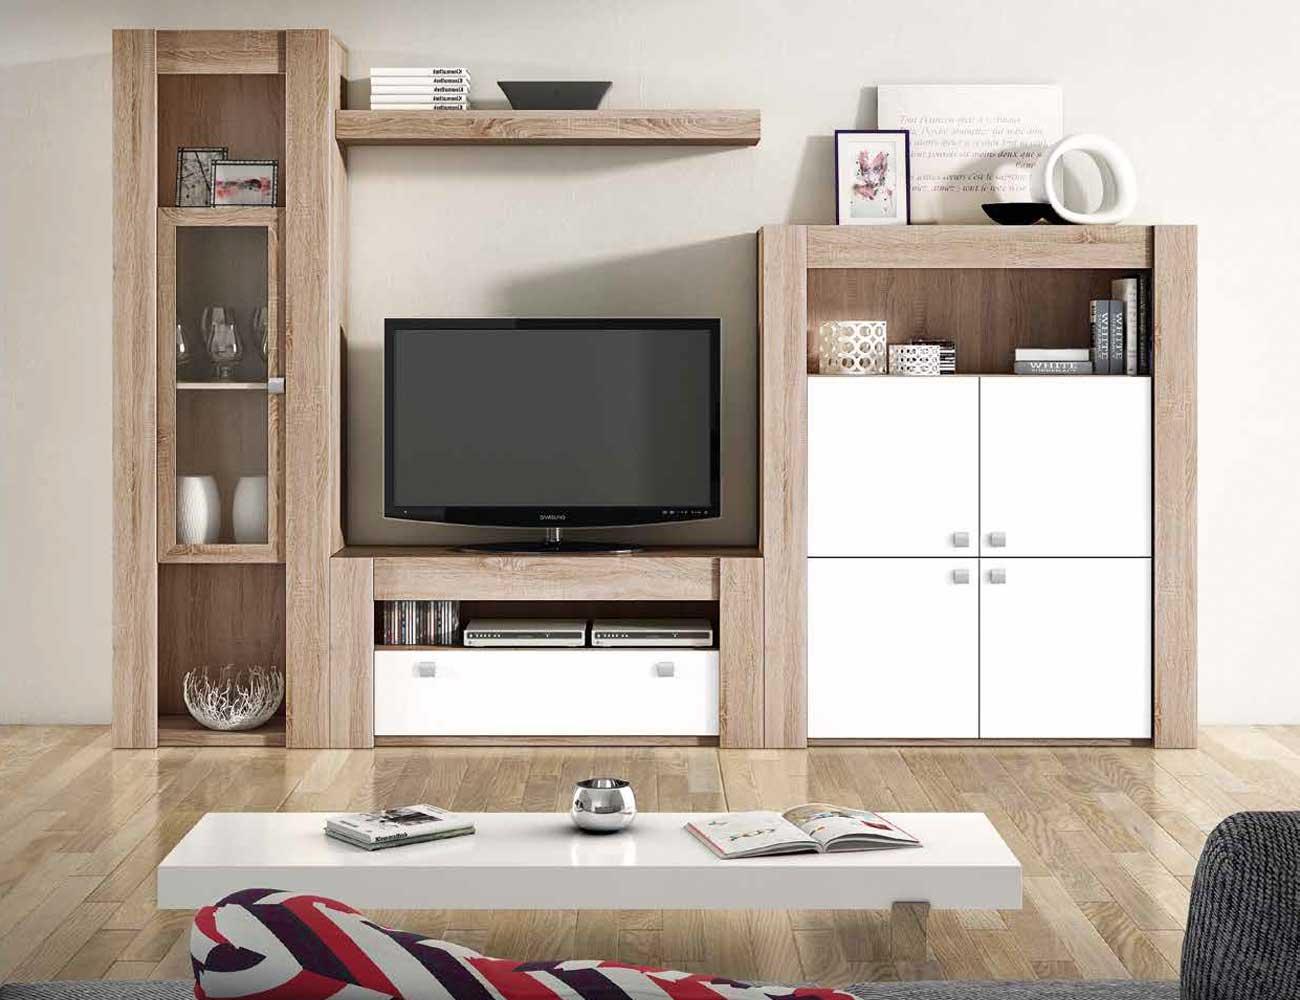 Mueble salon moderno comp05a1